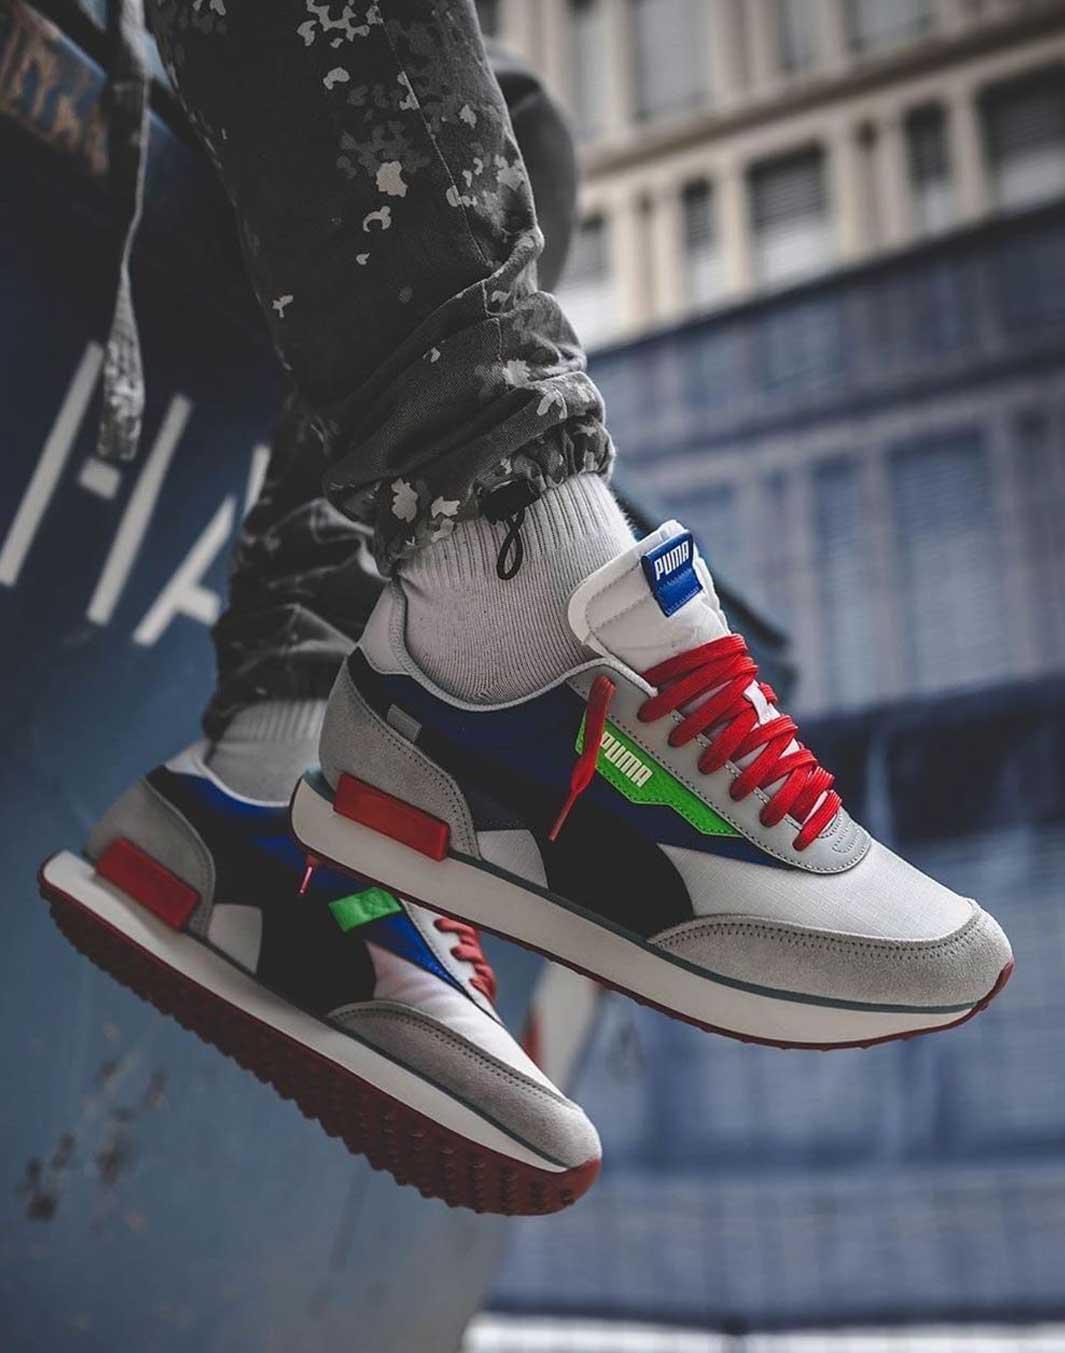 Shop Men's Sneakers at DrJays.com